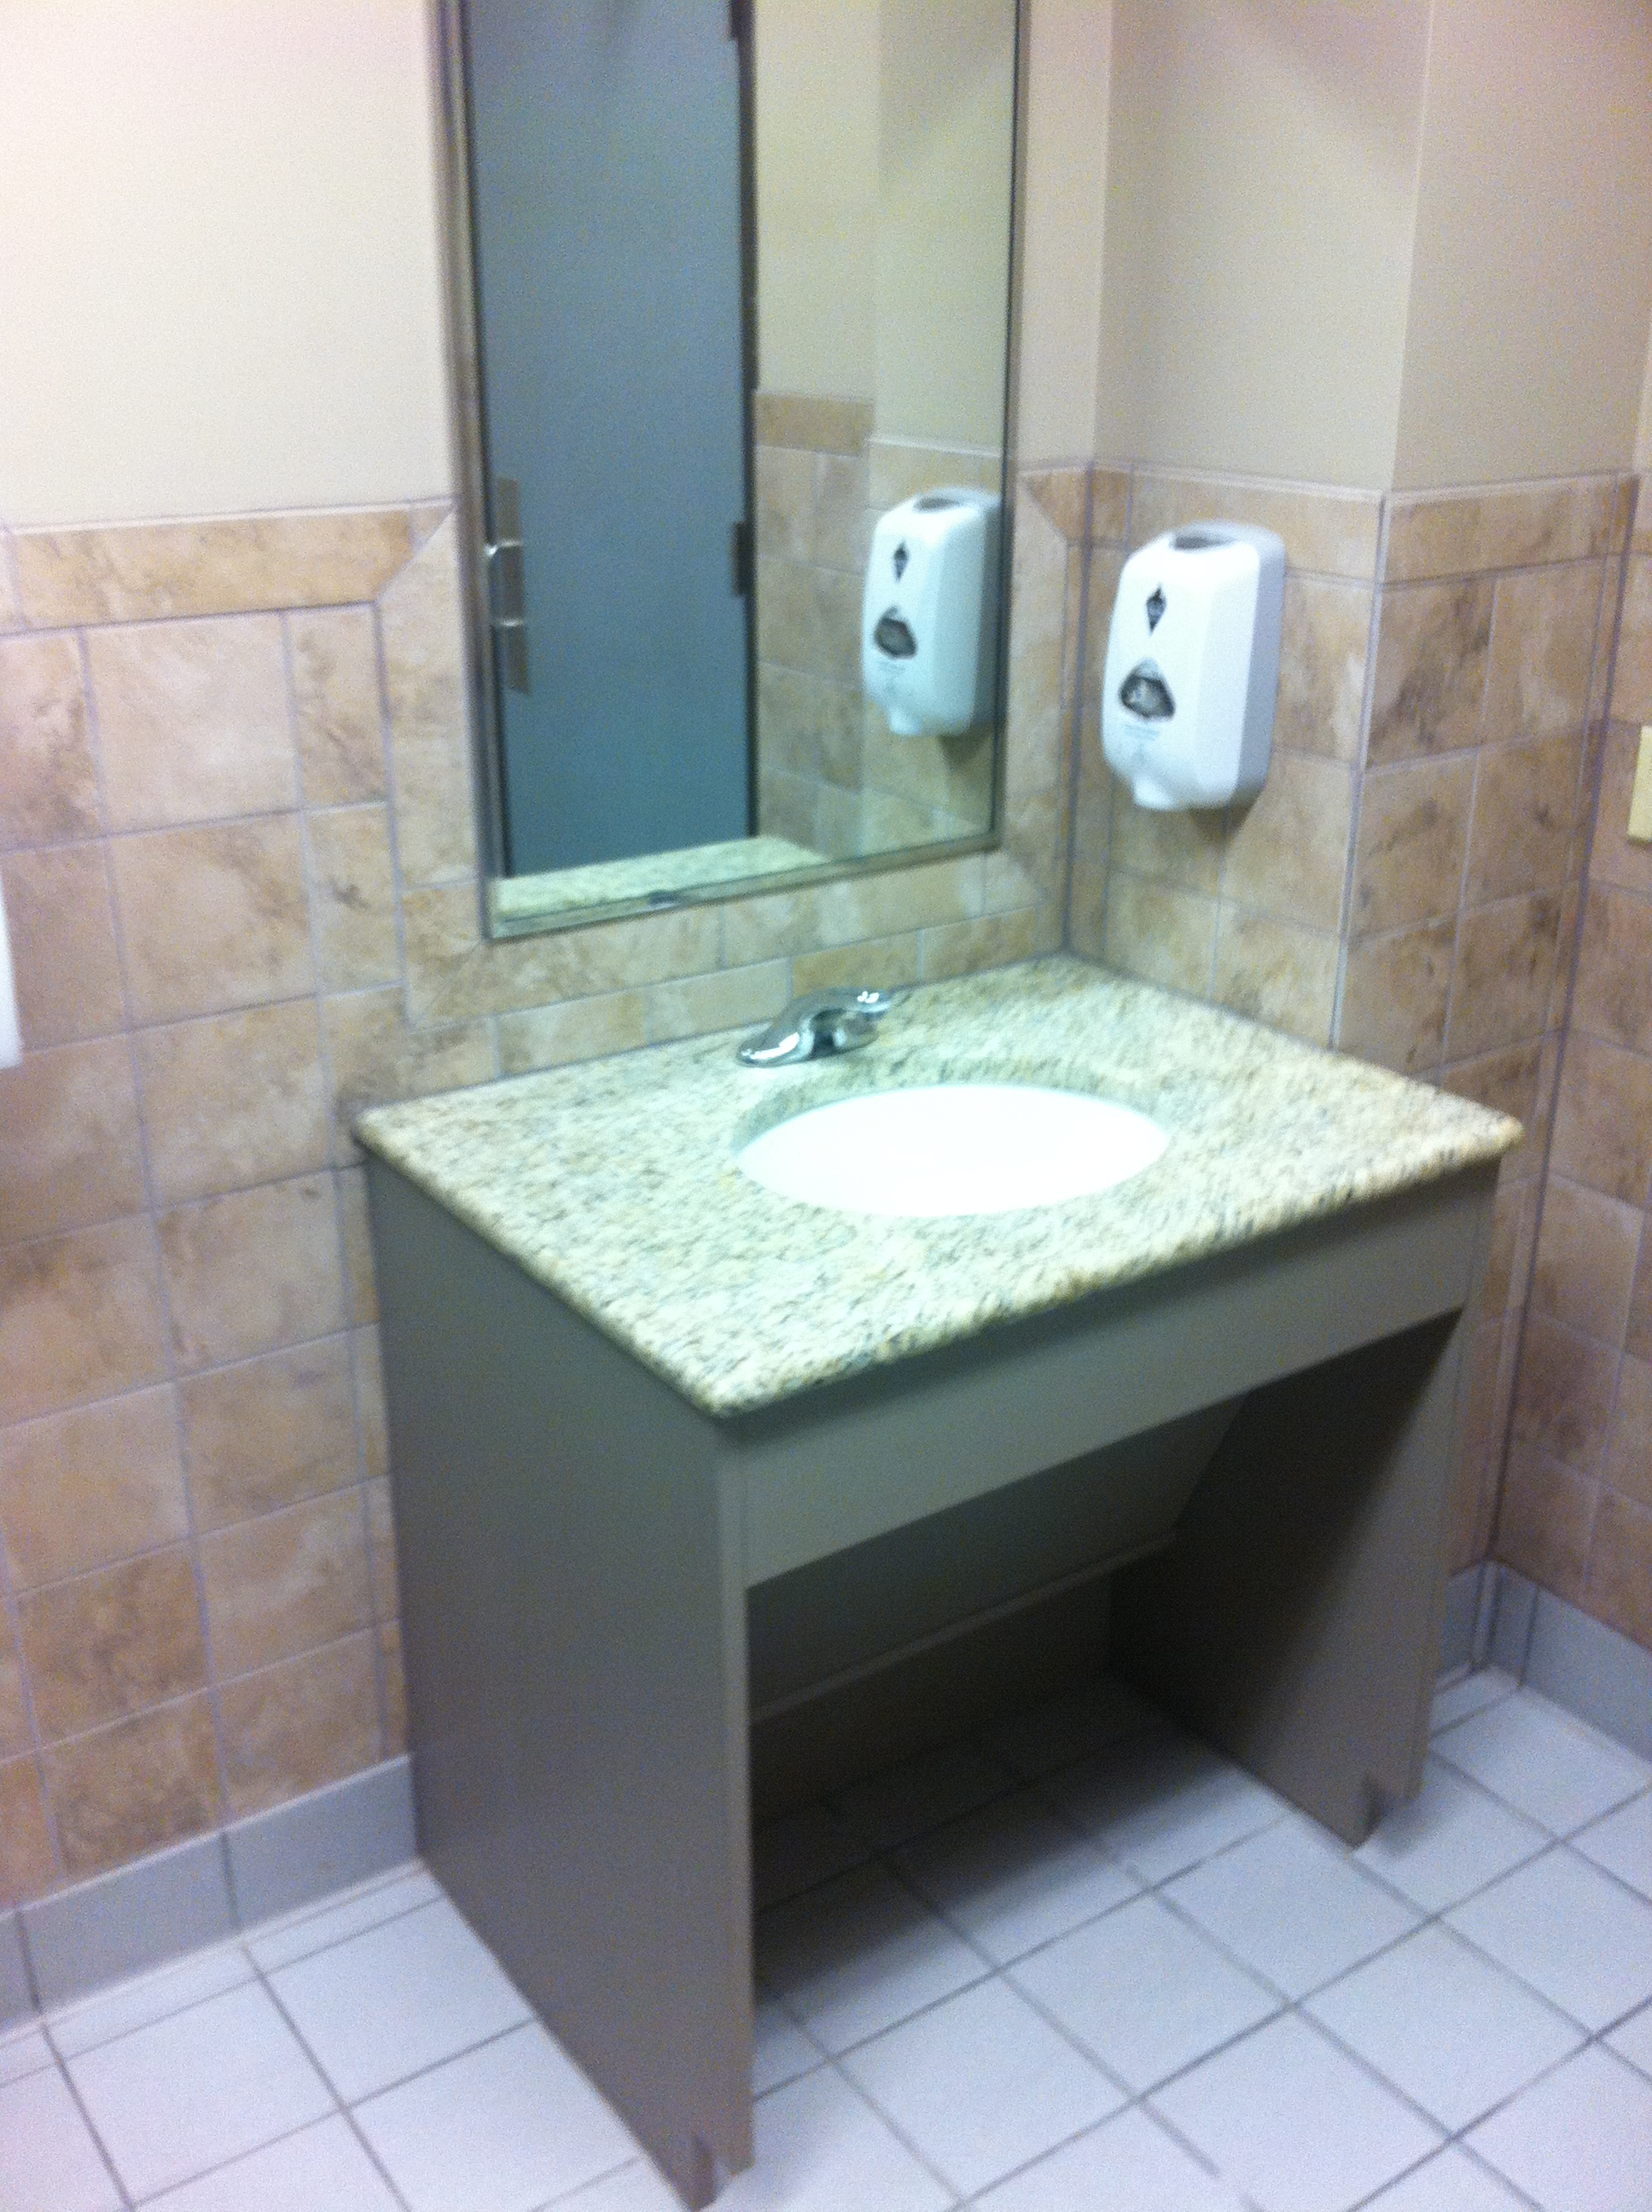 Commercial Bathroom Remodeling In Austin - Handicap accessible bathroom sink